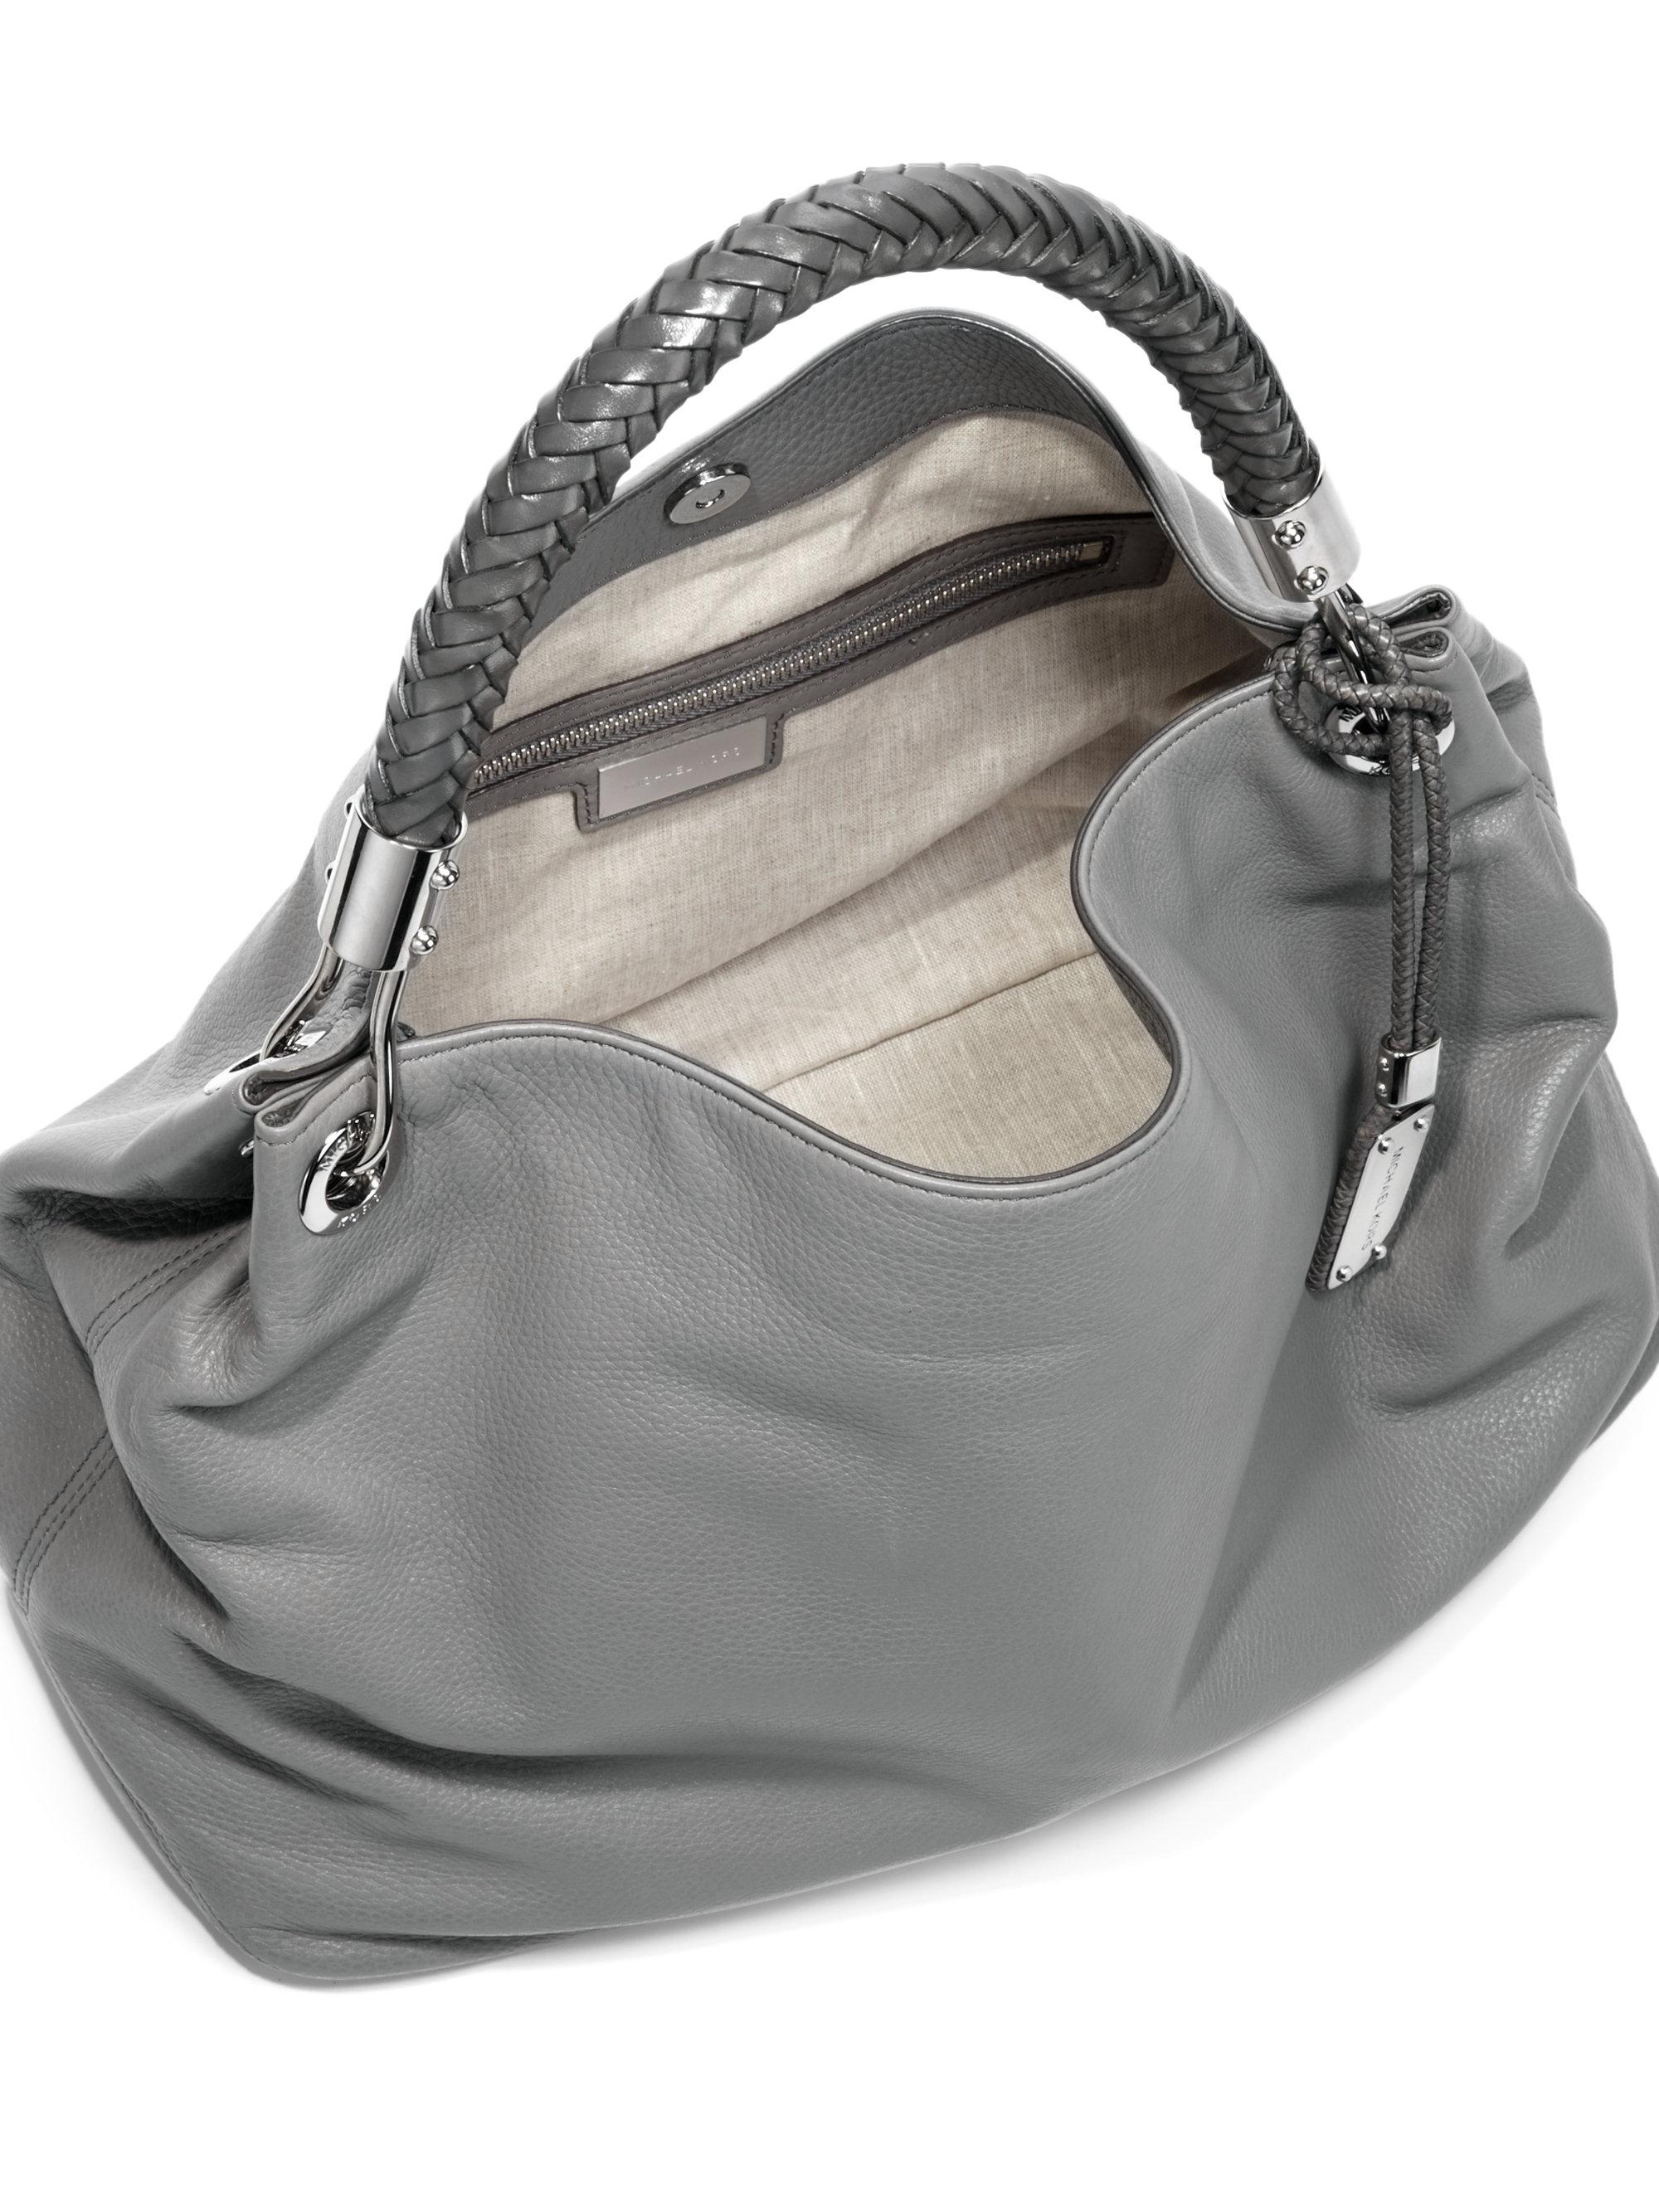 Lyst Michael Kors Skorpios Leather Shoulder Bag In Gray